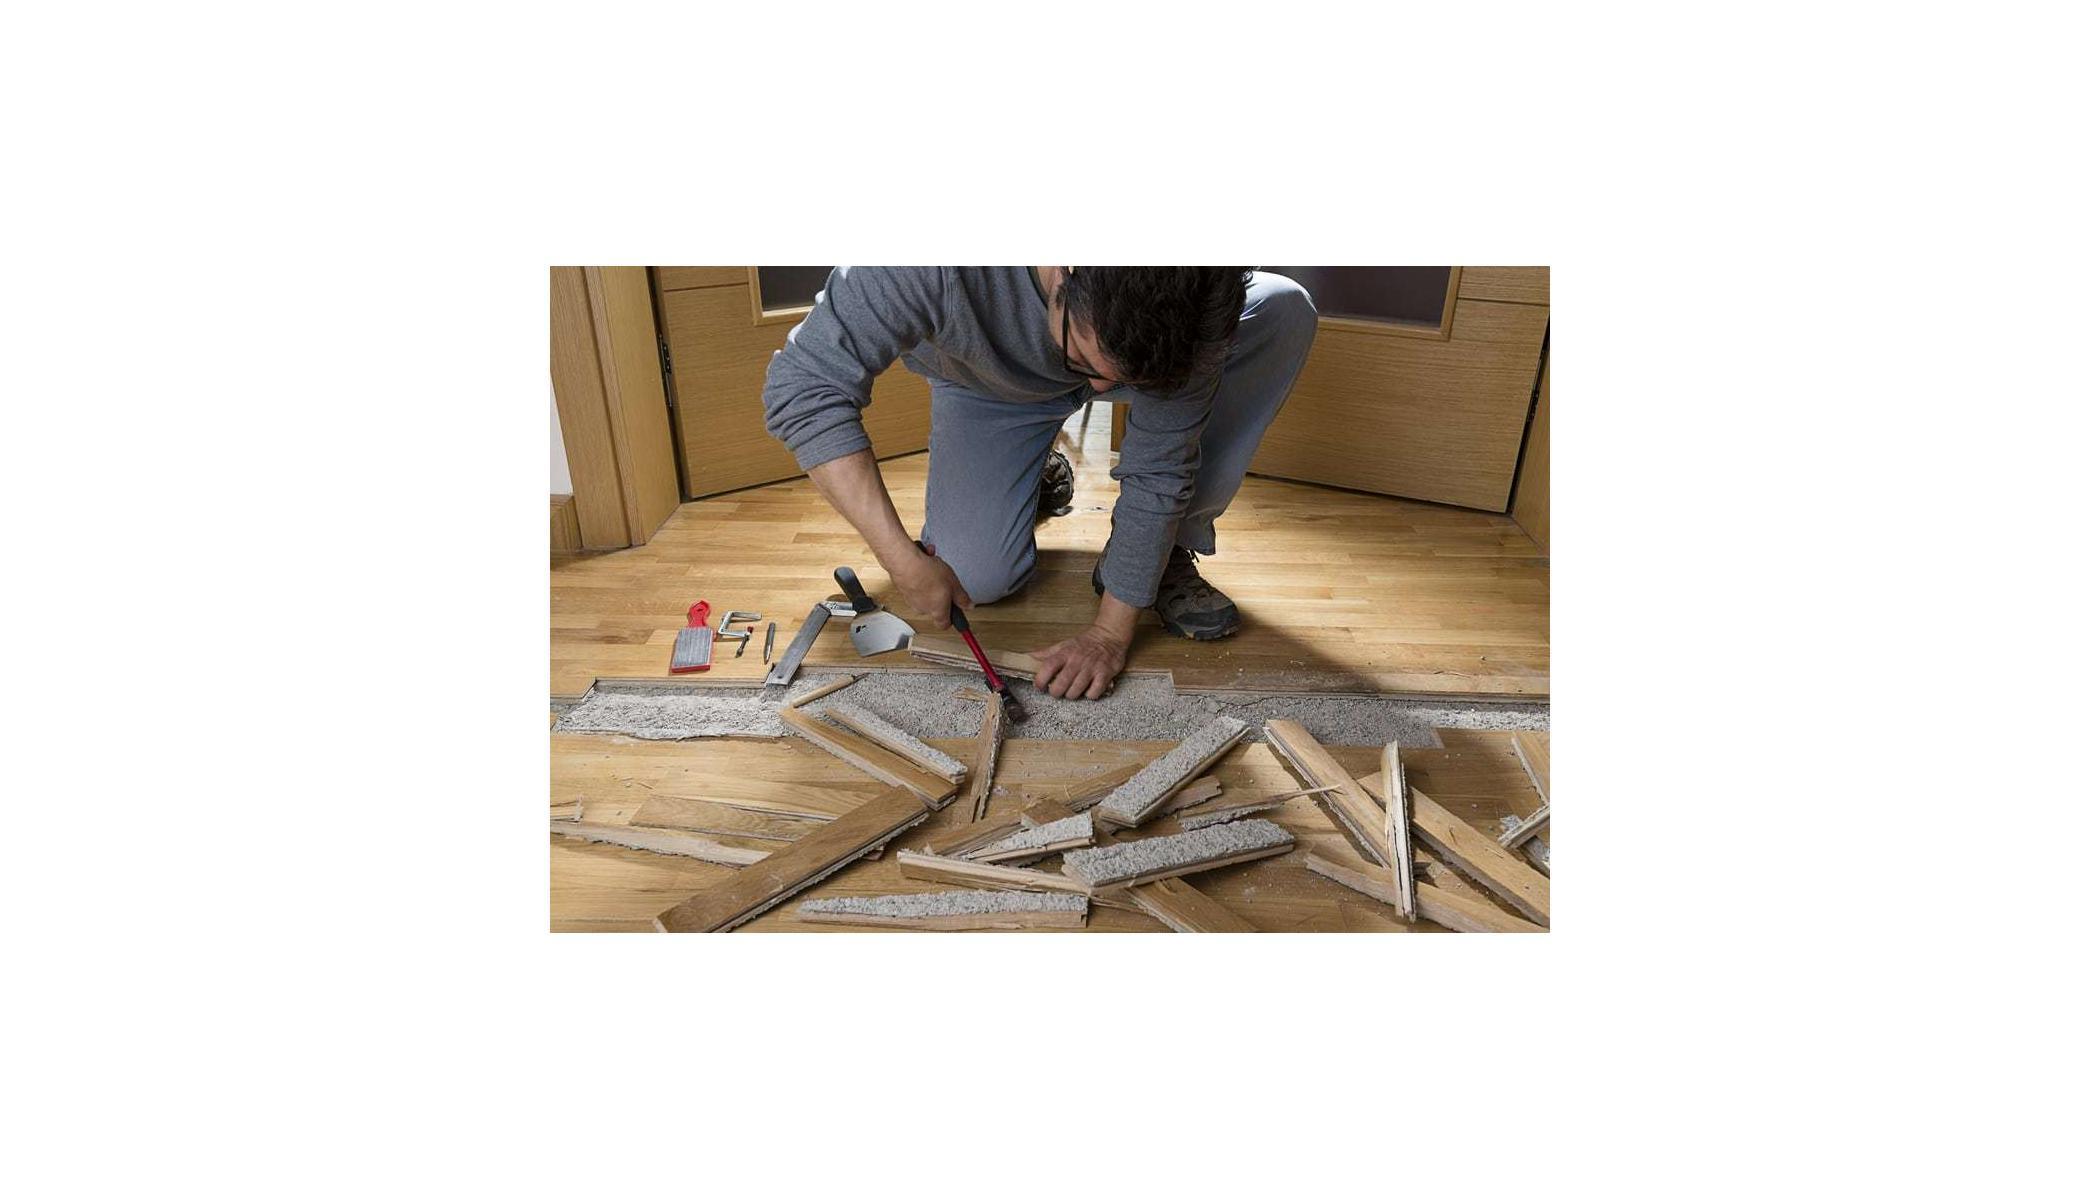 Water Damage To Hardwood Floor Should You Repair Or Replace